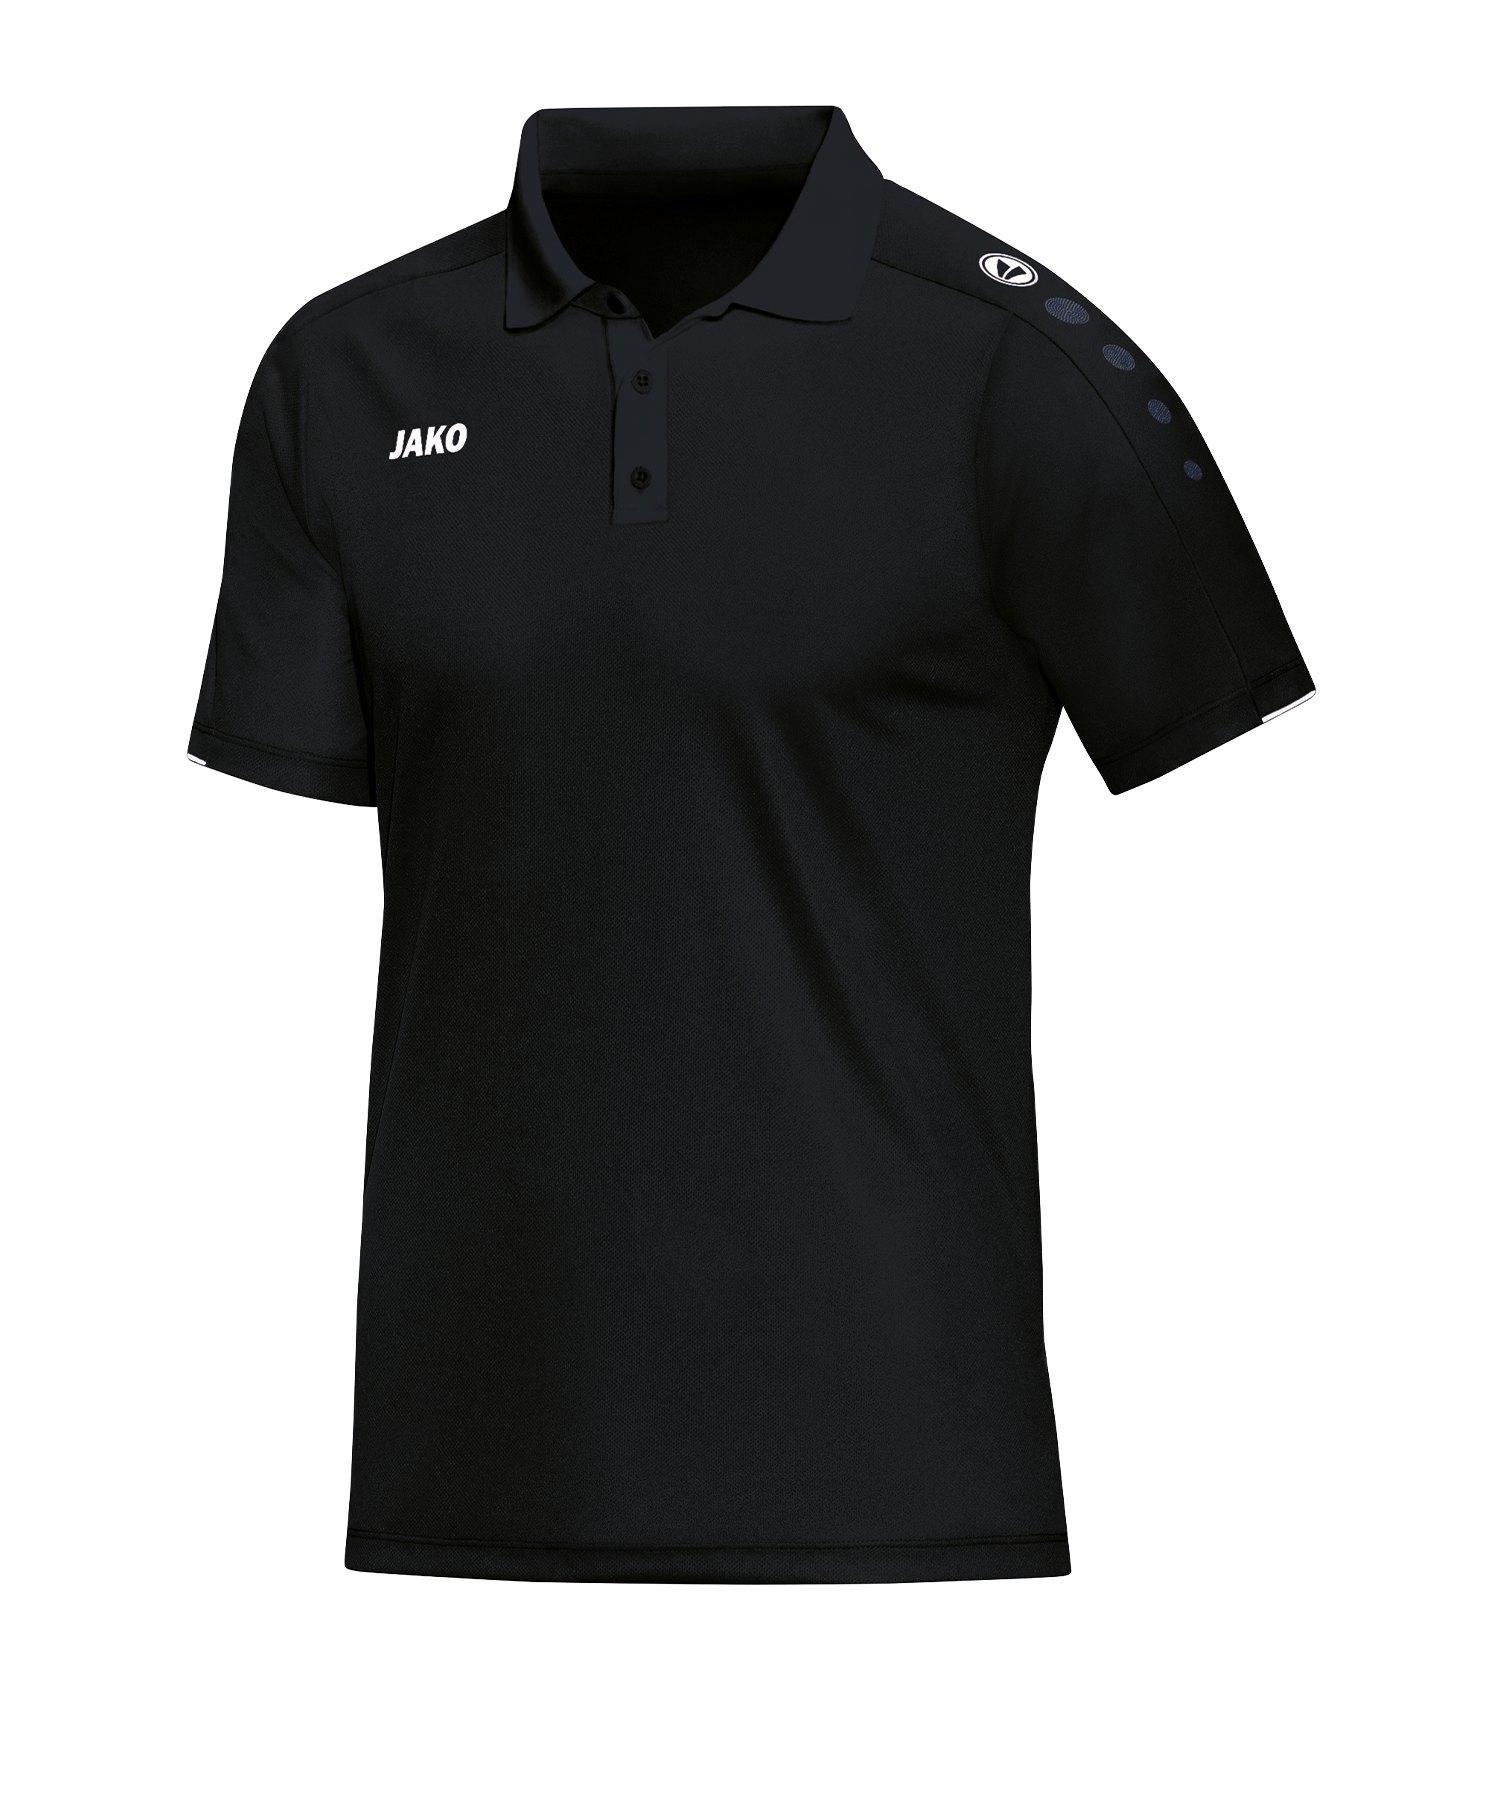 Jako Classico Poloshirt Damen Schwarz F08 - Schwarz